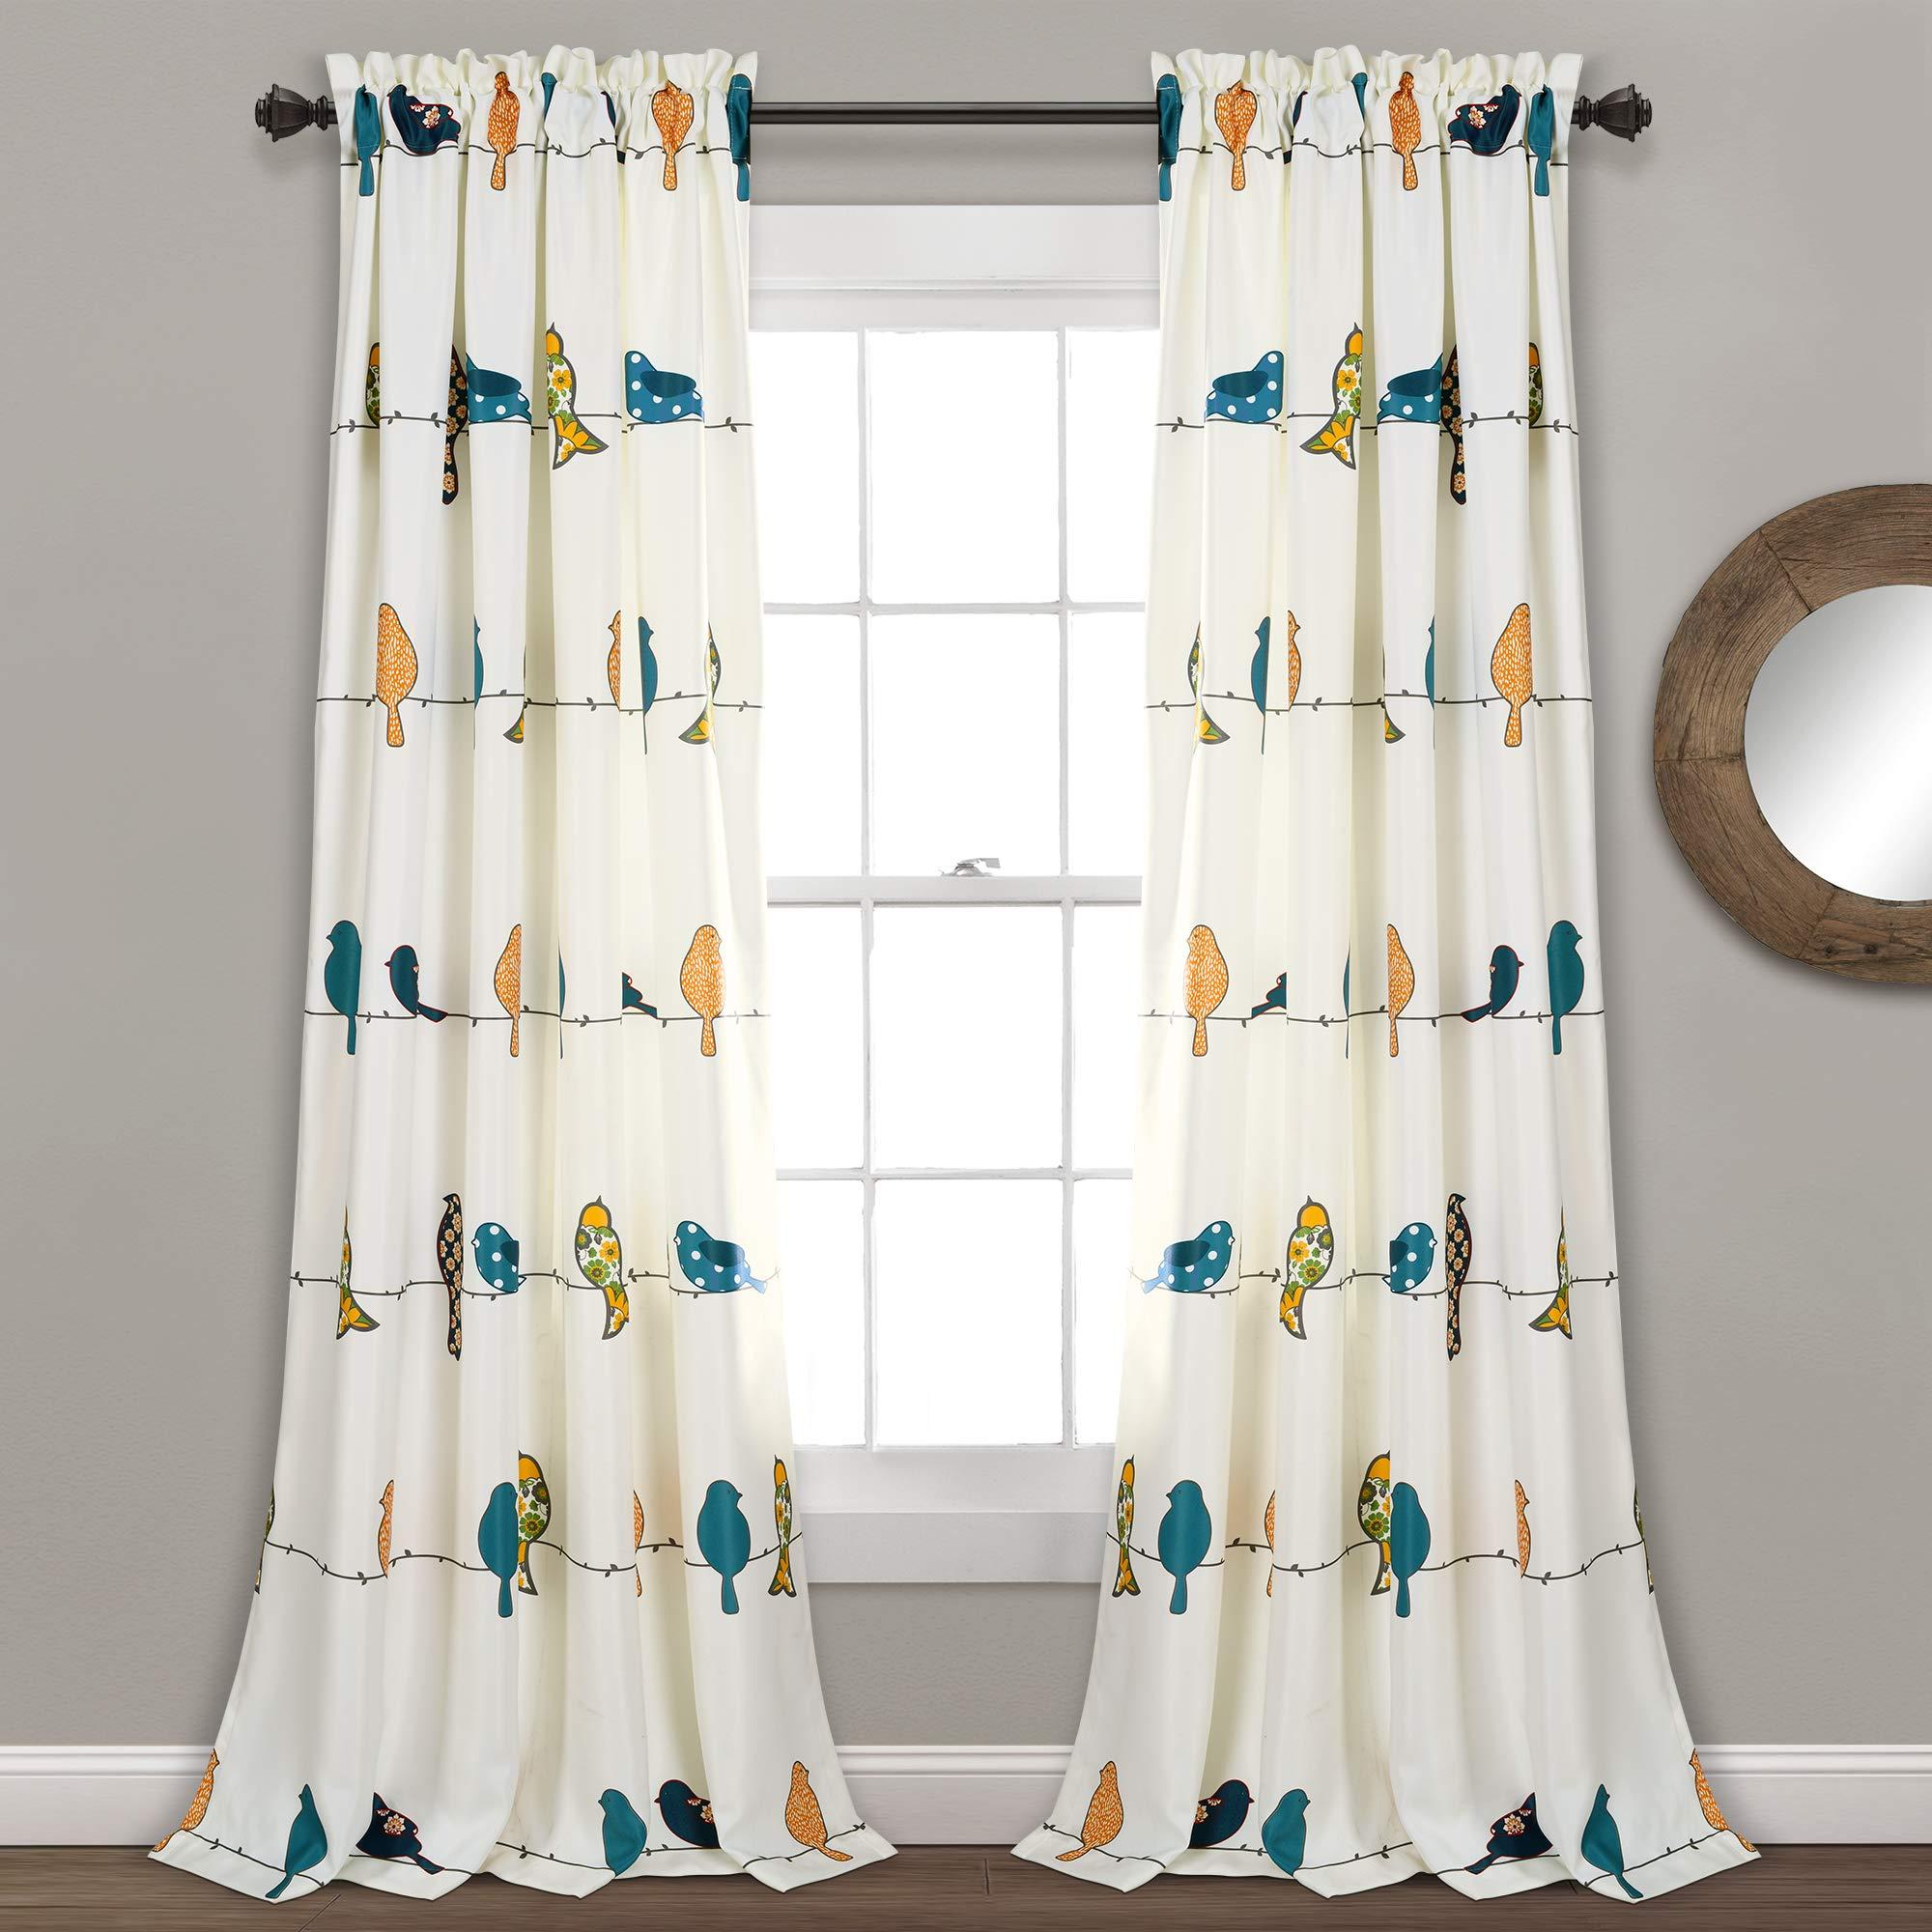 Lush Decor Rowley Birds Curtains Room Darkening Window Panel Set for Living, Dining, Bedroom (Pair), 84'' L, Multi by Lush Decor